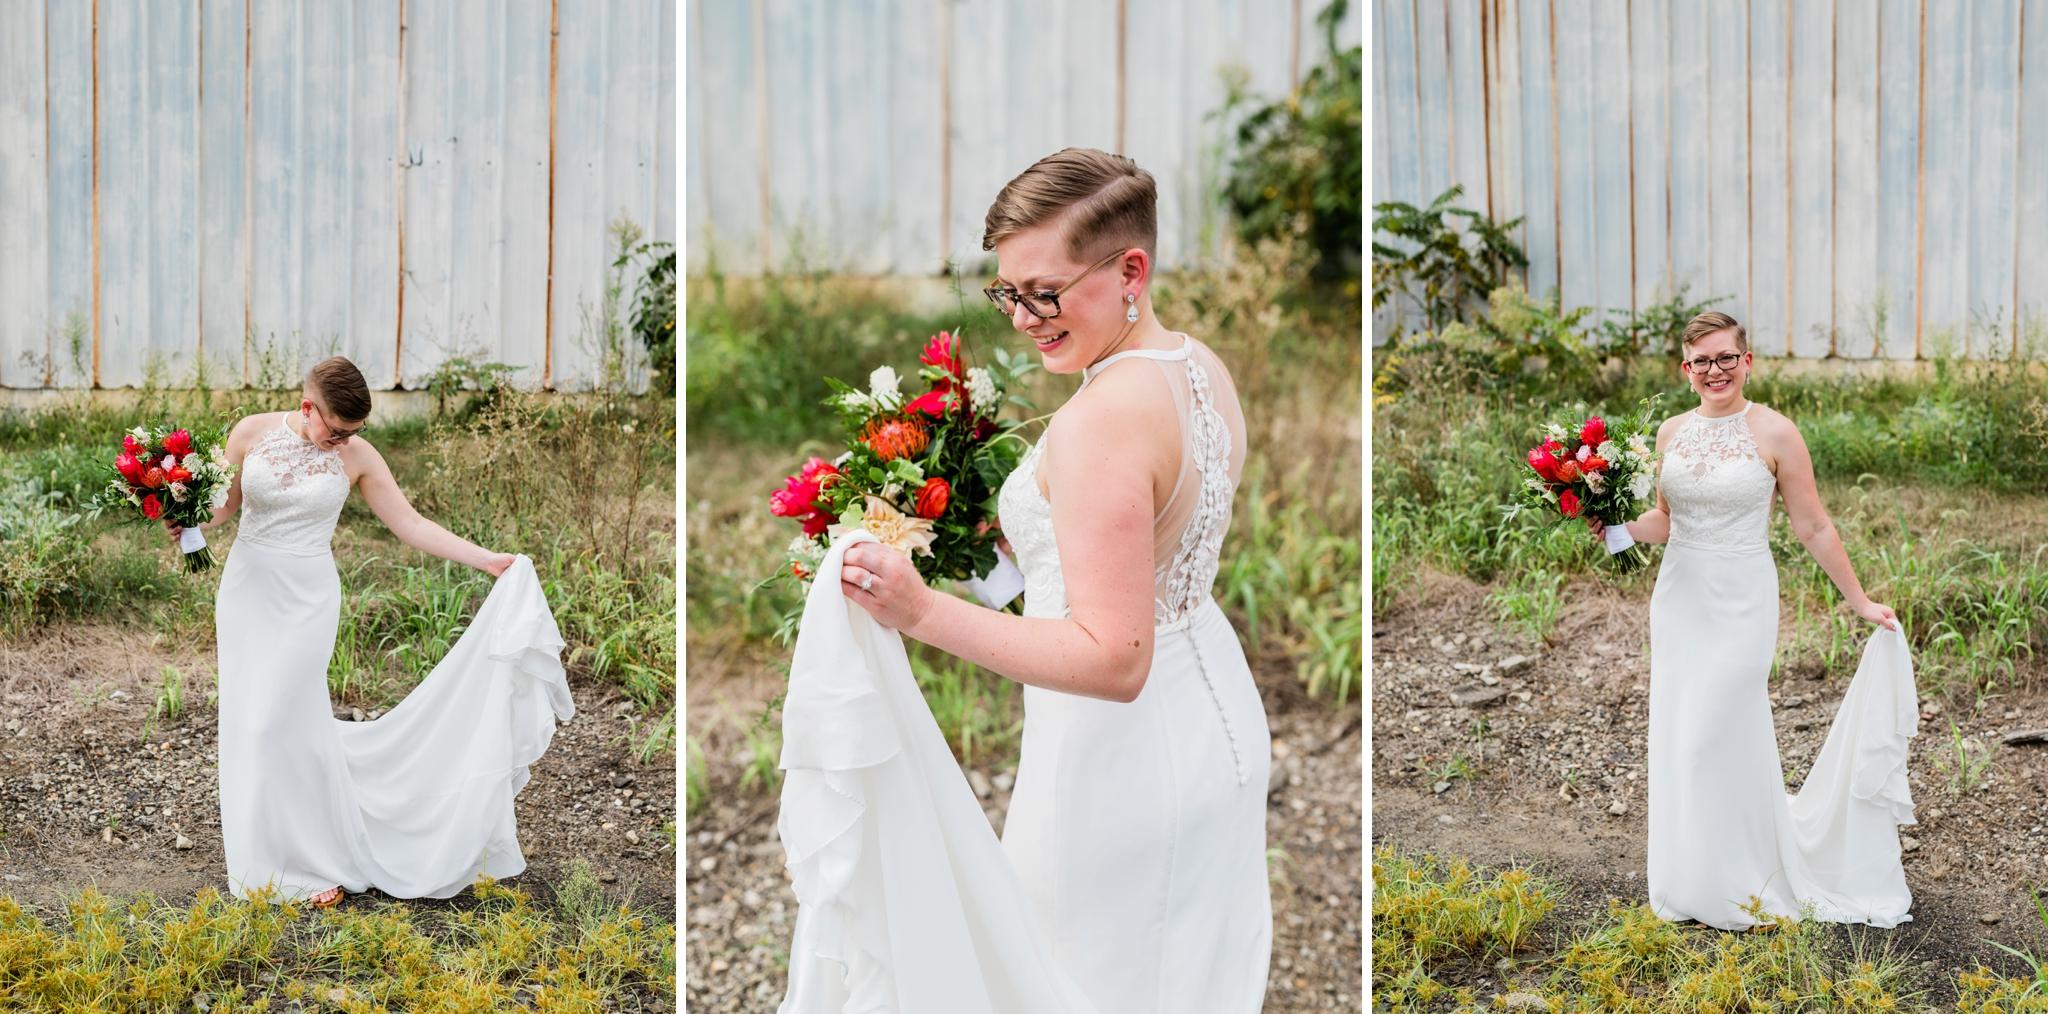 Emily Grace Photography, Lancaster PA Wedding Photographer, The Booking House Wedding Venue, Manheim PA Wedding Venue, The Booking House Manheim Bridesmaid Photos, Central PA Wedding Photographer